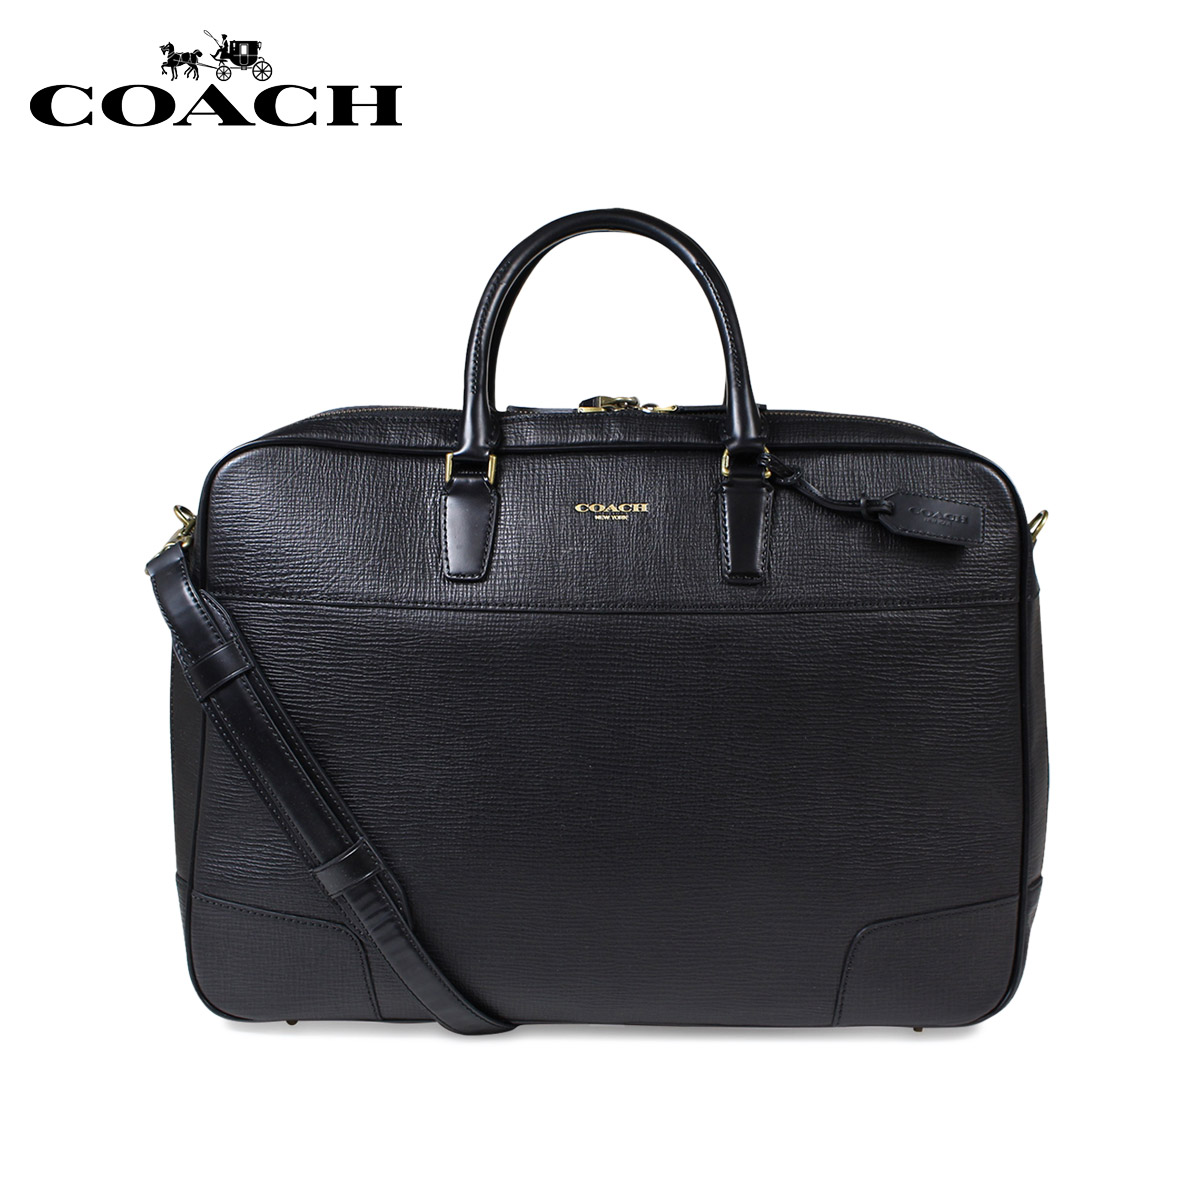 cde35f8593db Coach suitcase men COACH genuine leather briefcase business bag F93282  black black